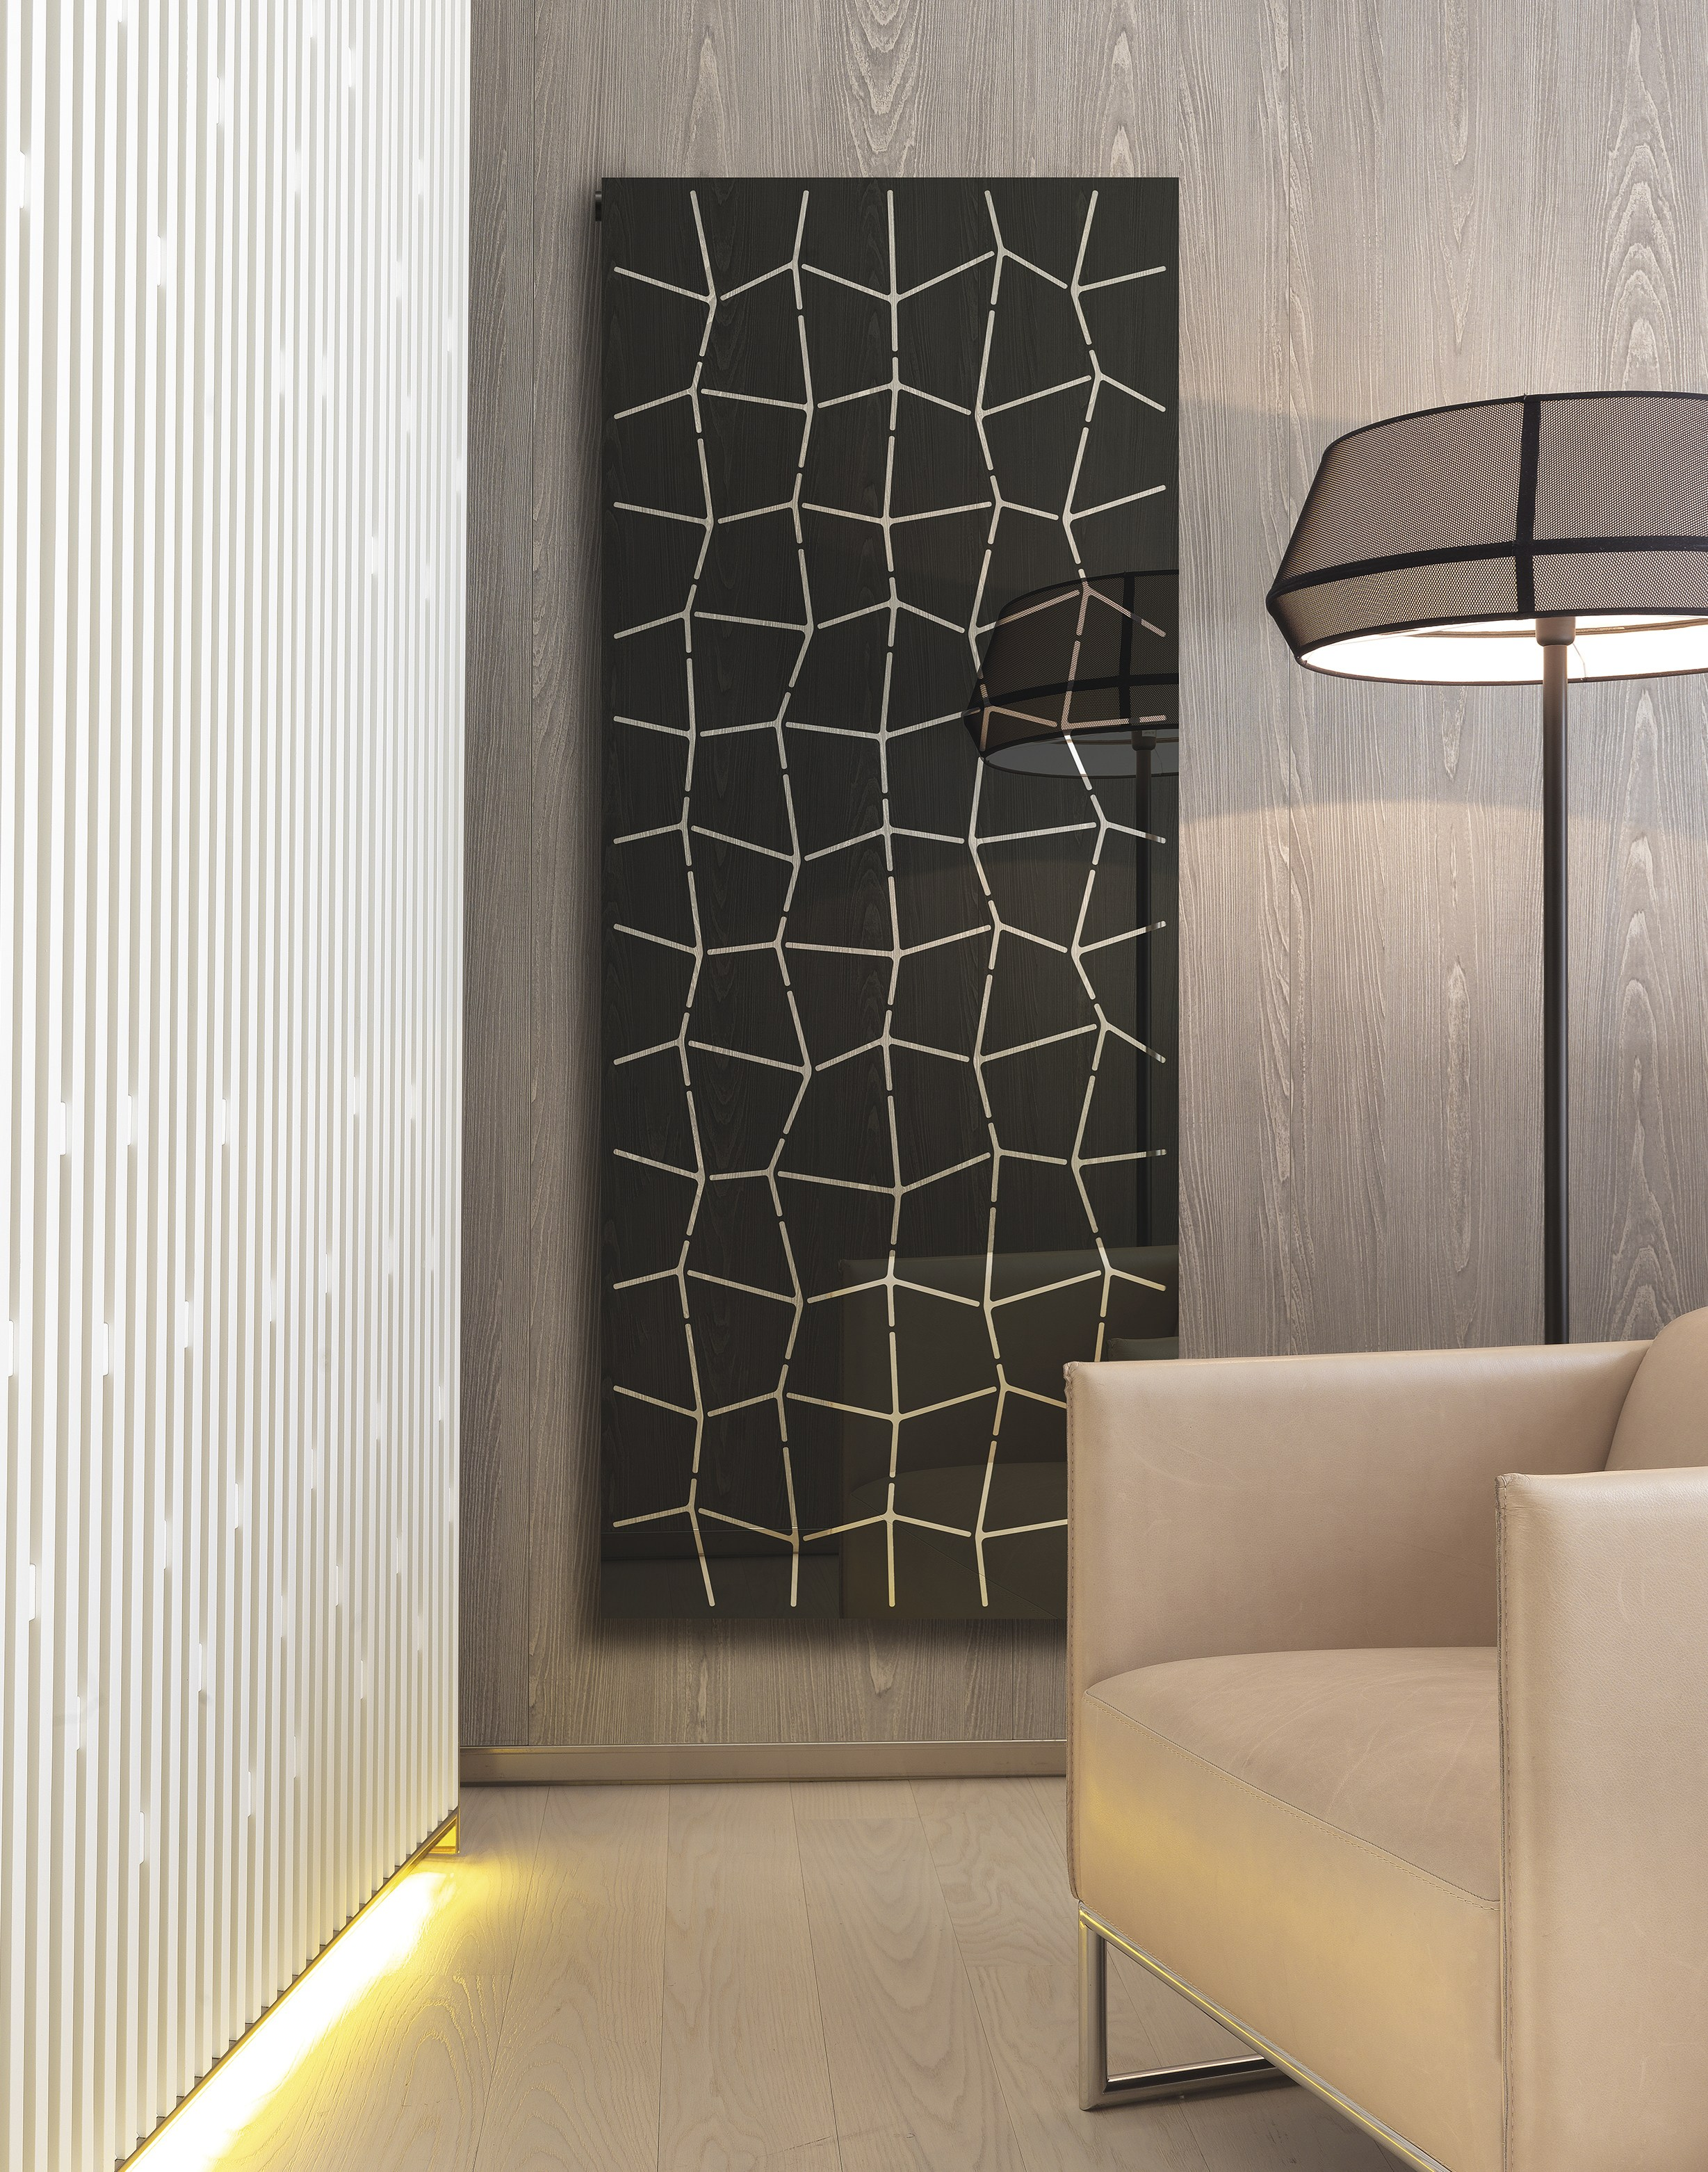 Termoarredo a parete trama by k8 radiatori design marco pisati - Radiatori a parete prezzi ...